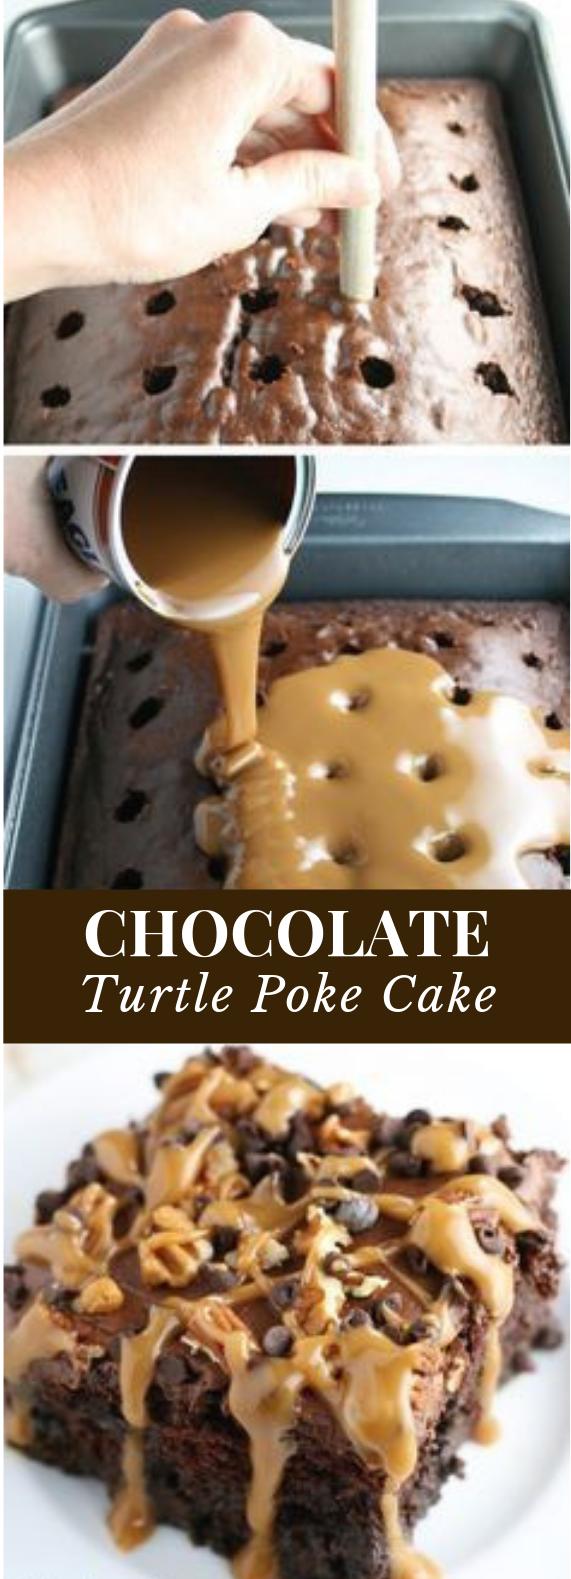 CHOCOLATE TURTLE POKE CAKE #pokecake #chocolate